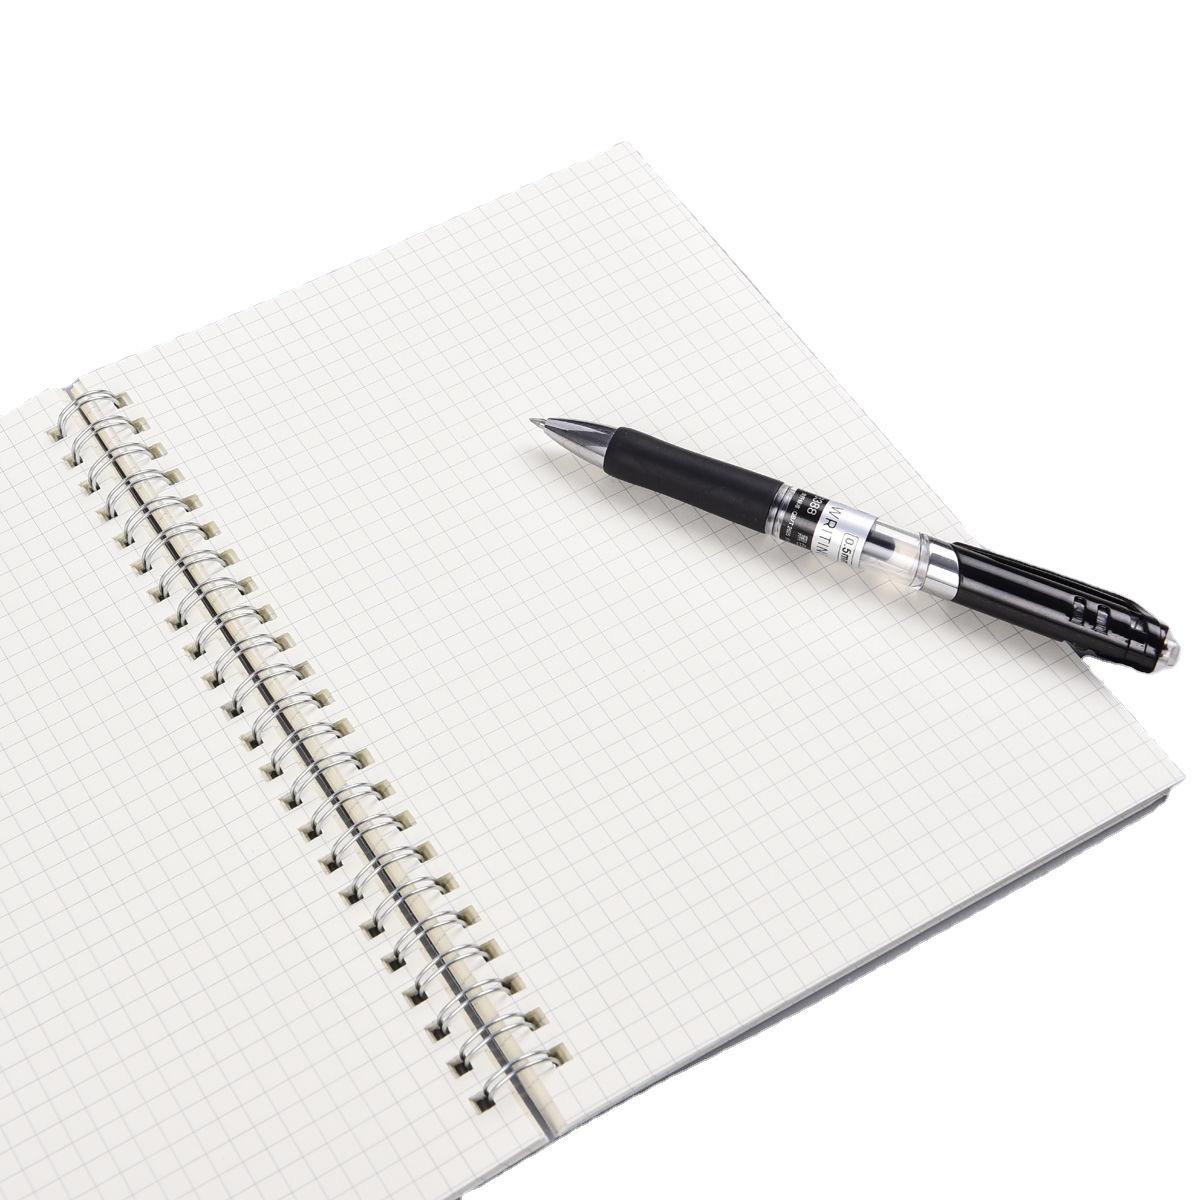 Custom Braided Elastic Band Plastic Book Cover Grid Notebook Spiral Binding